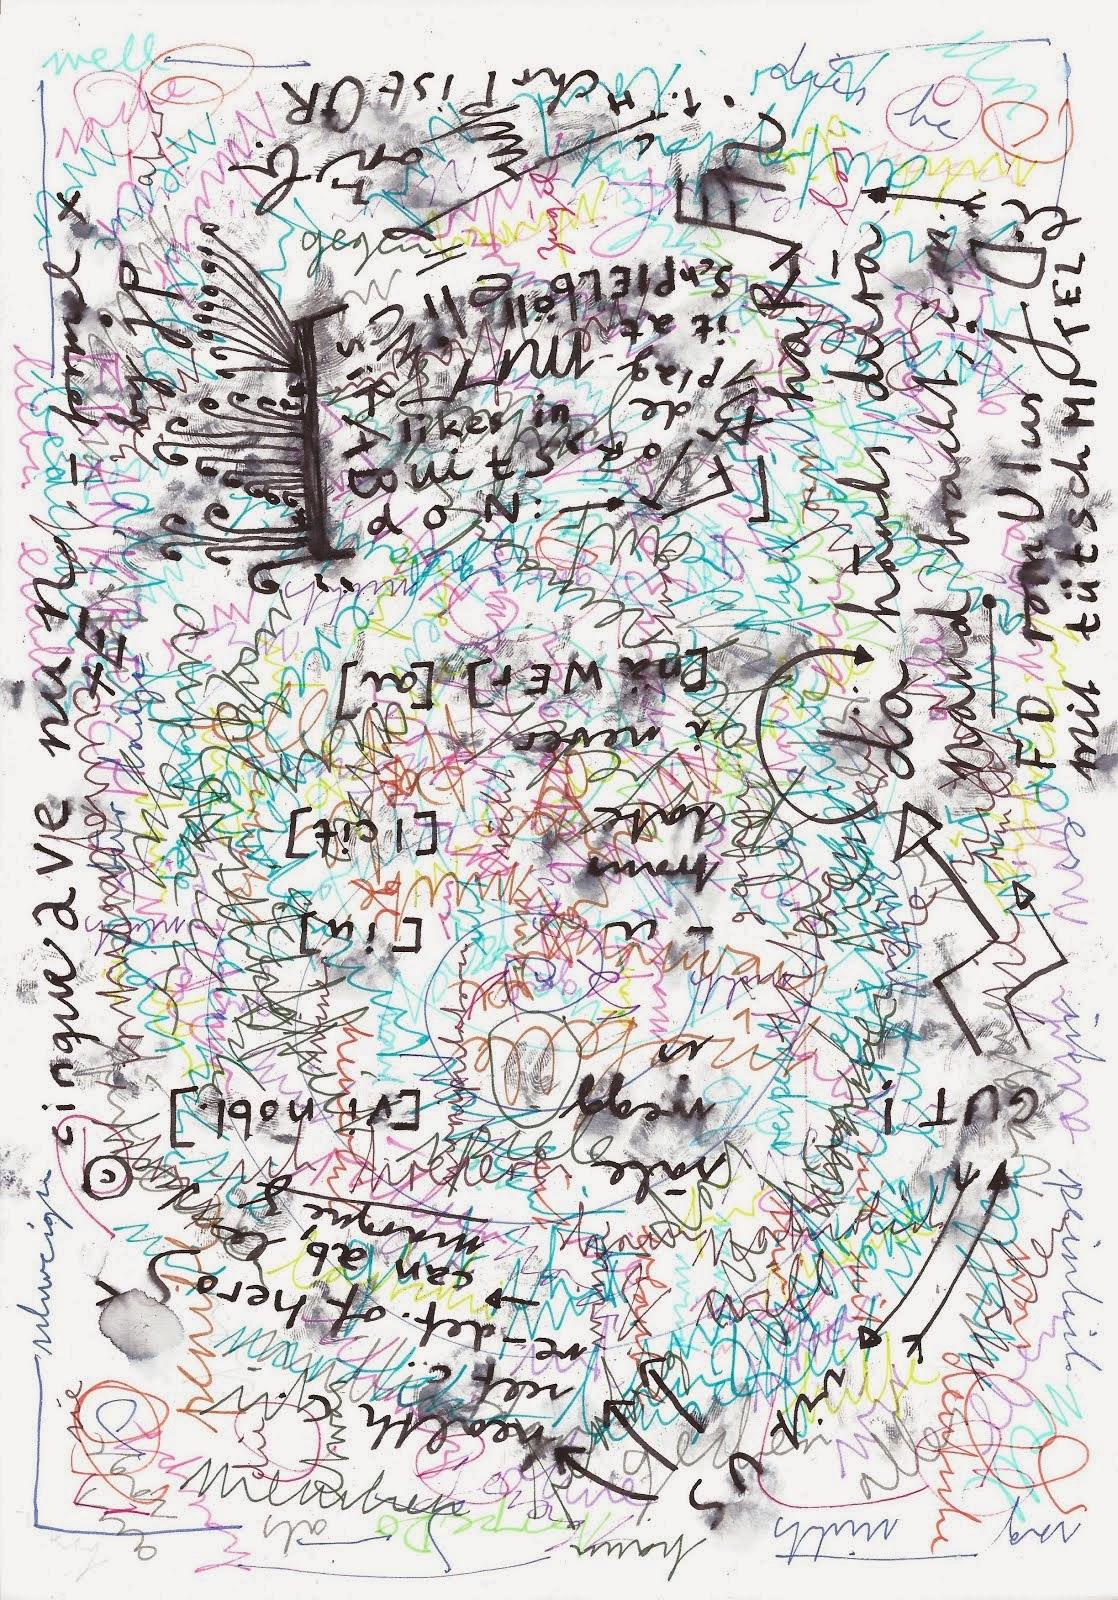 AINTE la POESIA - in solchen zeiten - panthéales - gedichte poèmes mischa vetere 2013 mine de rien